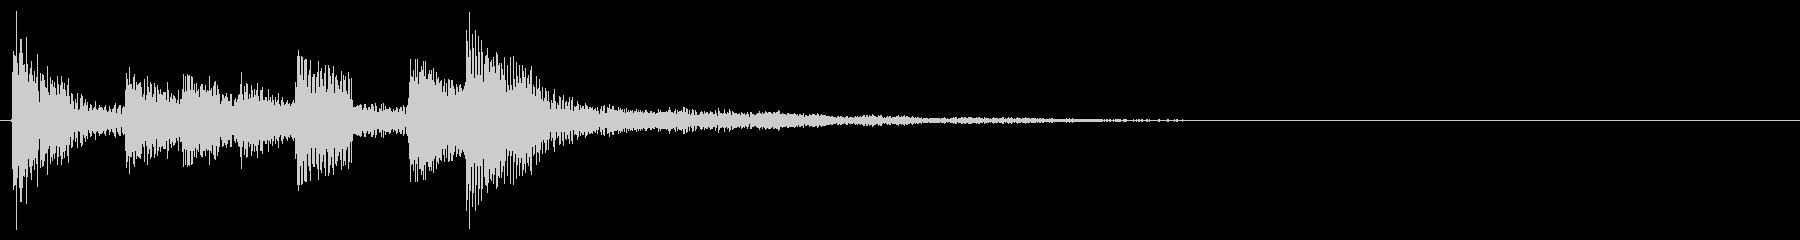 KANT近未来アラーム011043の未再生の波形